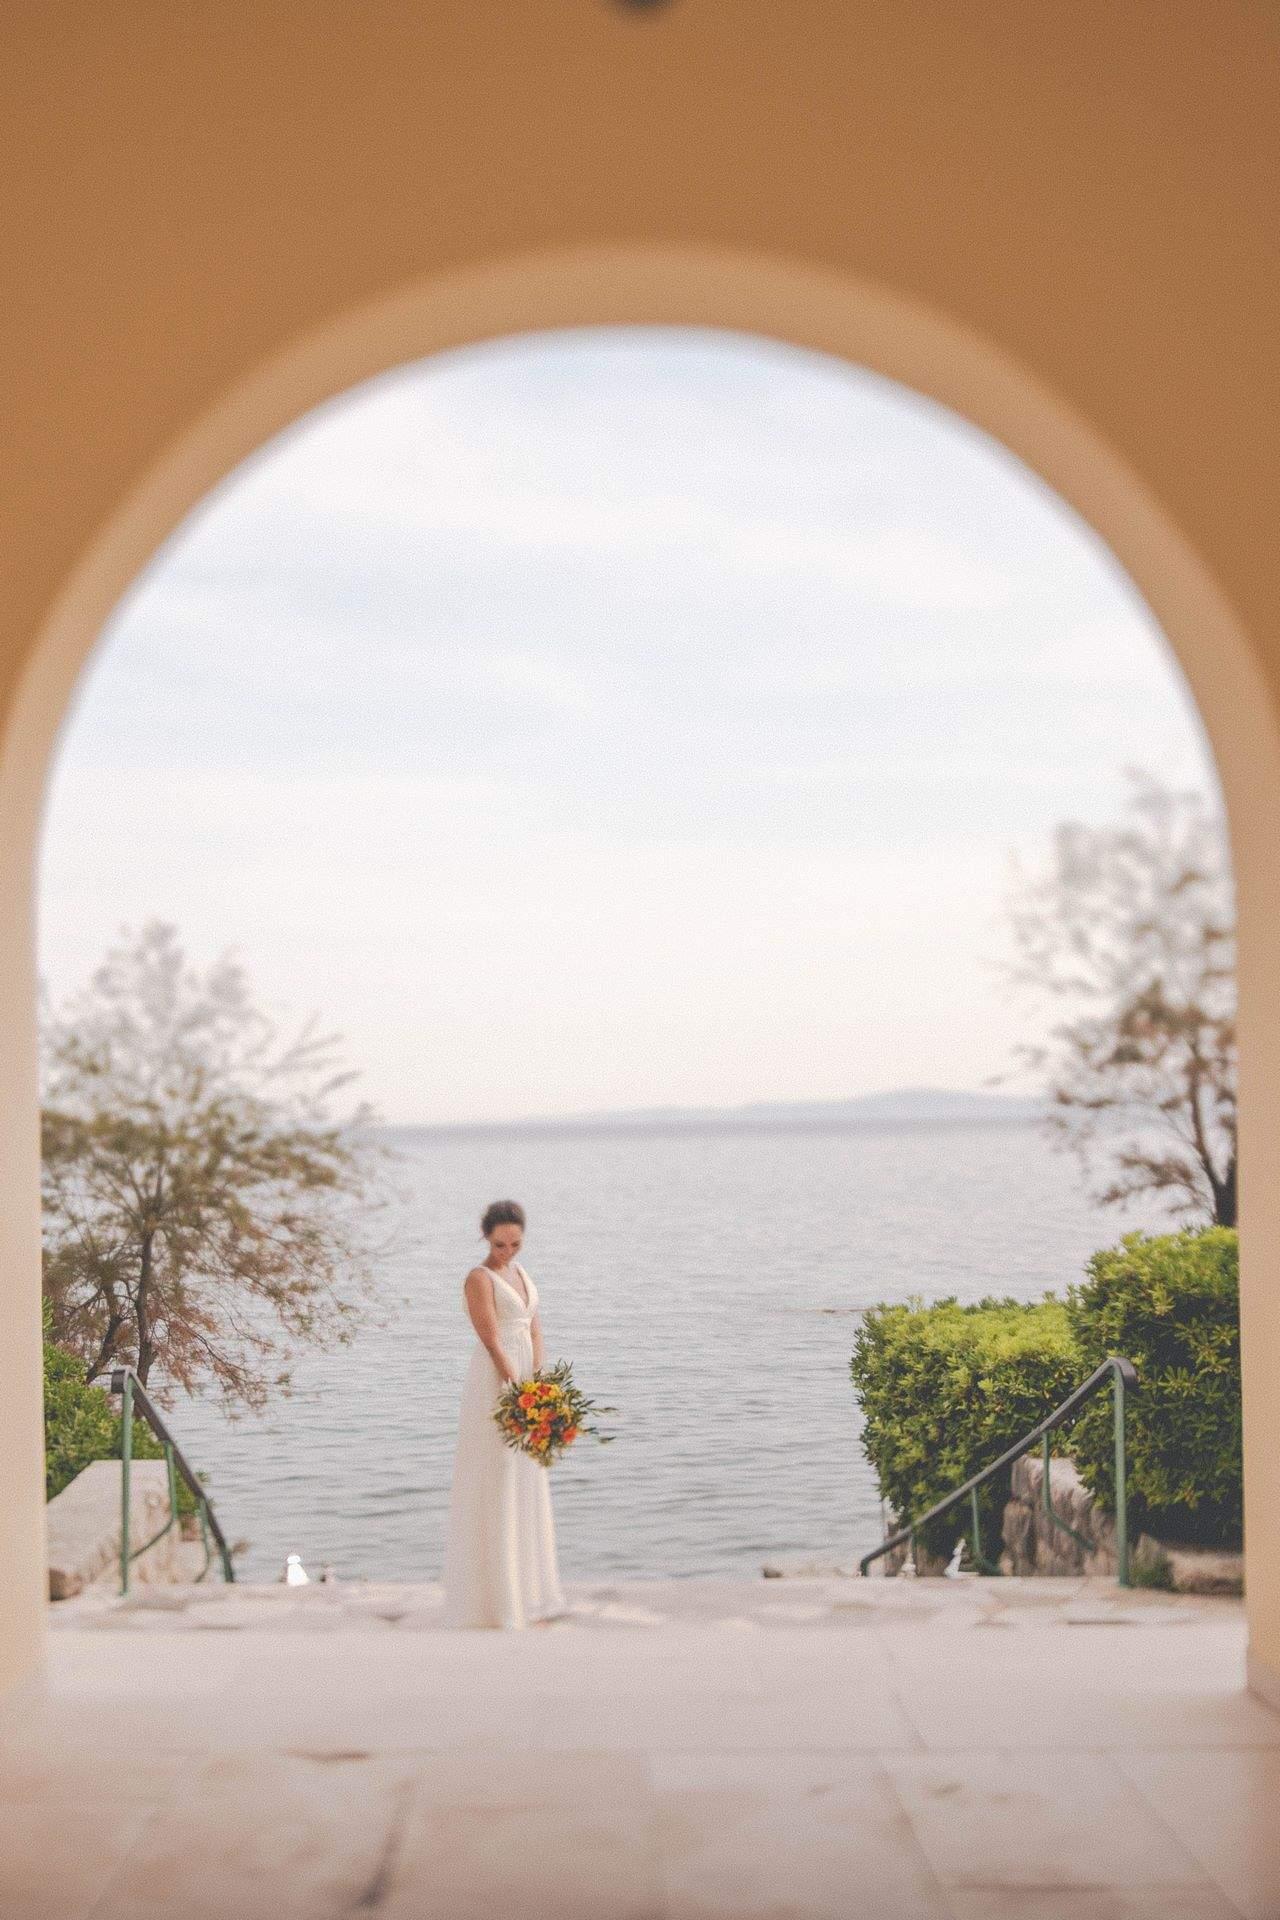 wedding-photographer-split-villa-dalmatia-128